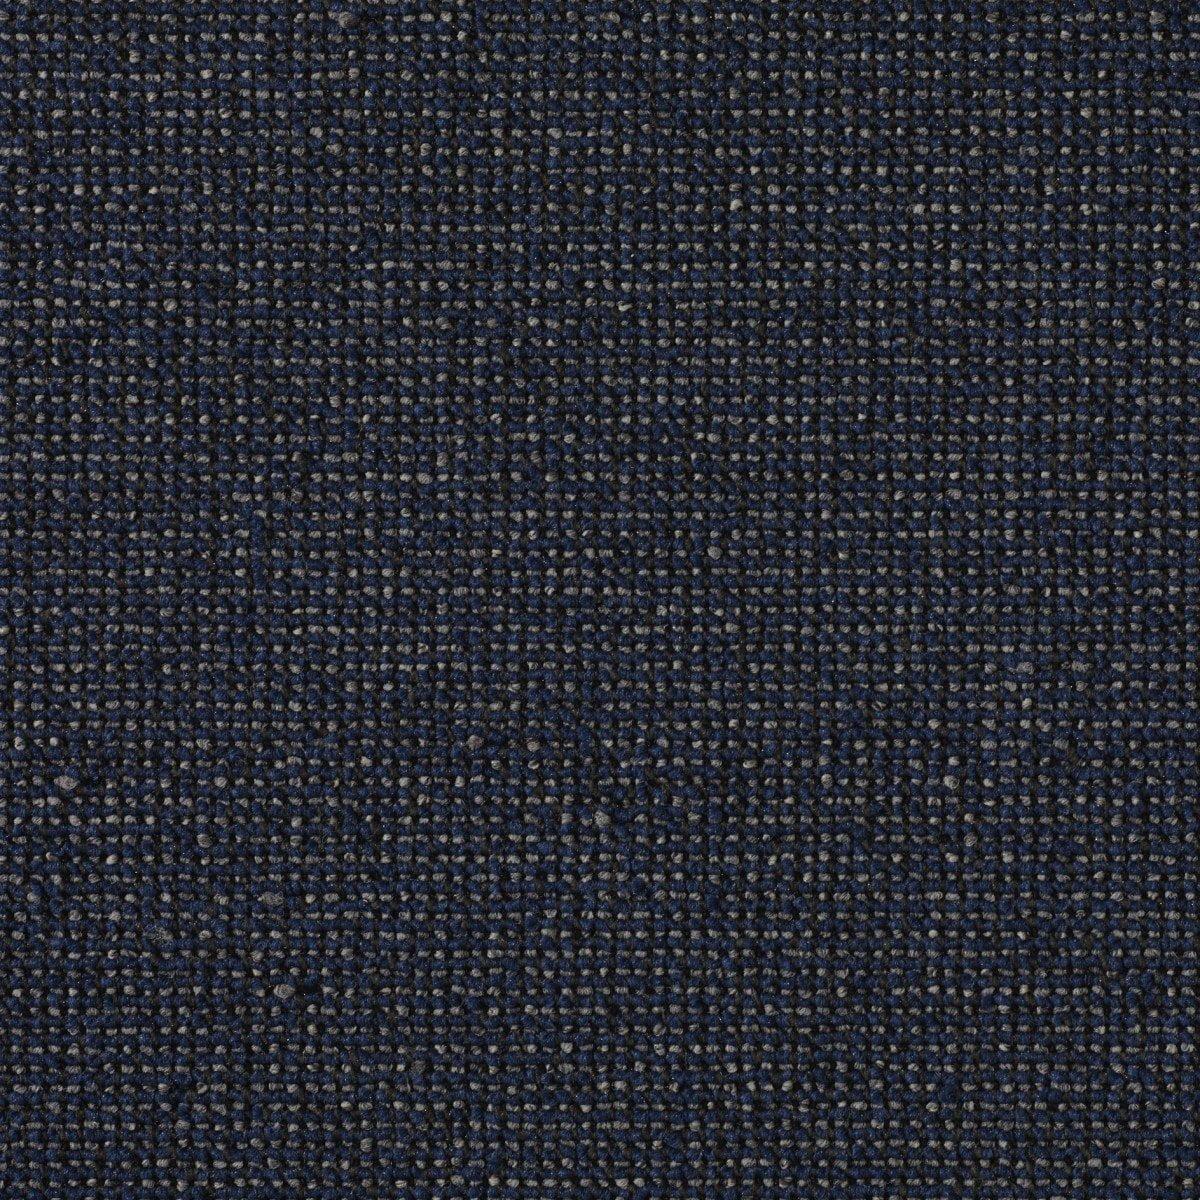 Amsterdam blå - Tæpper med kant